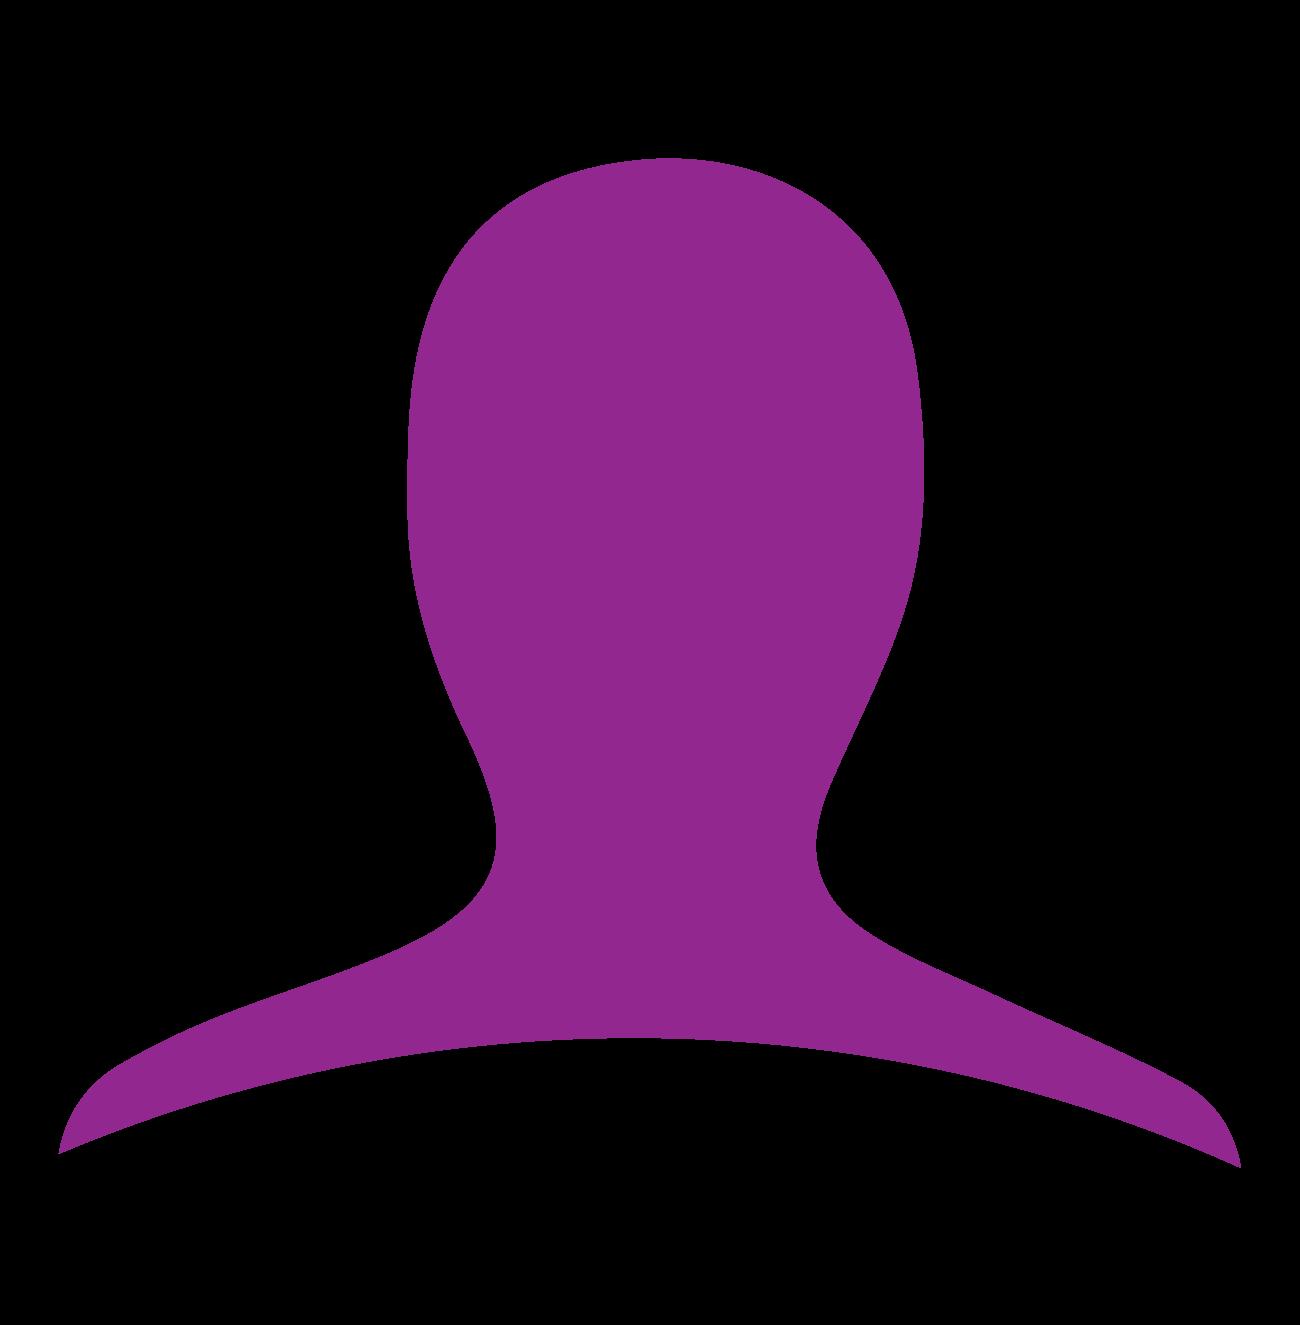 pac-logo-purple-silhouette.png